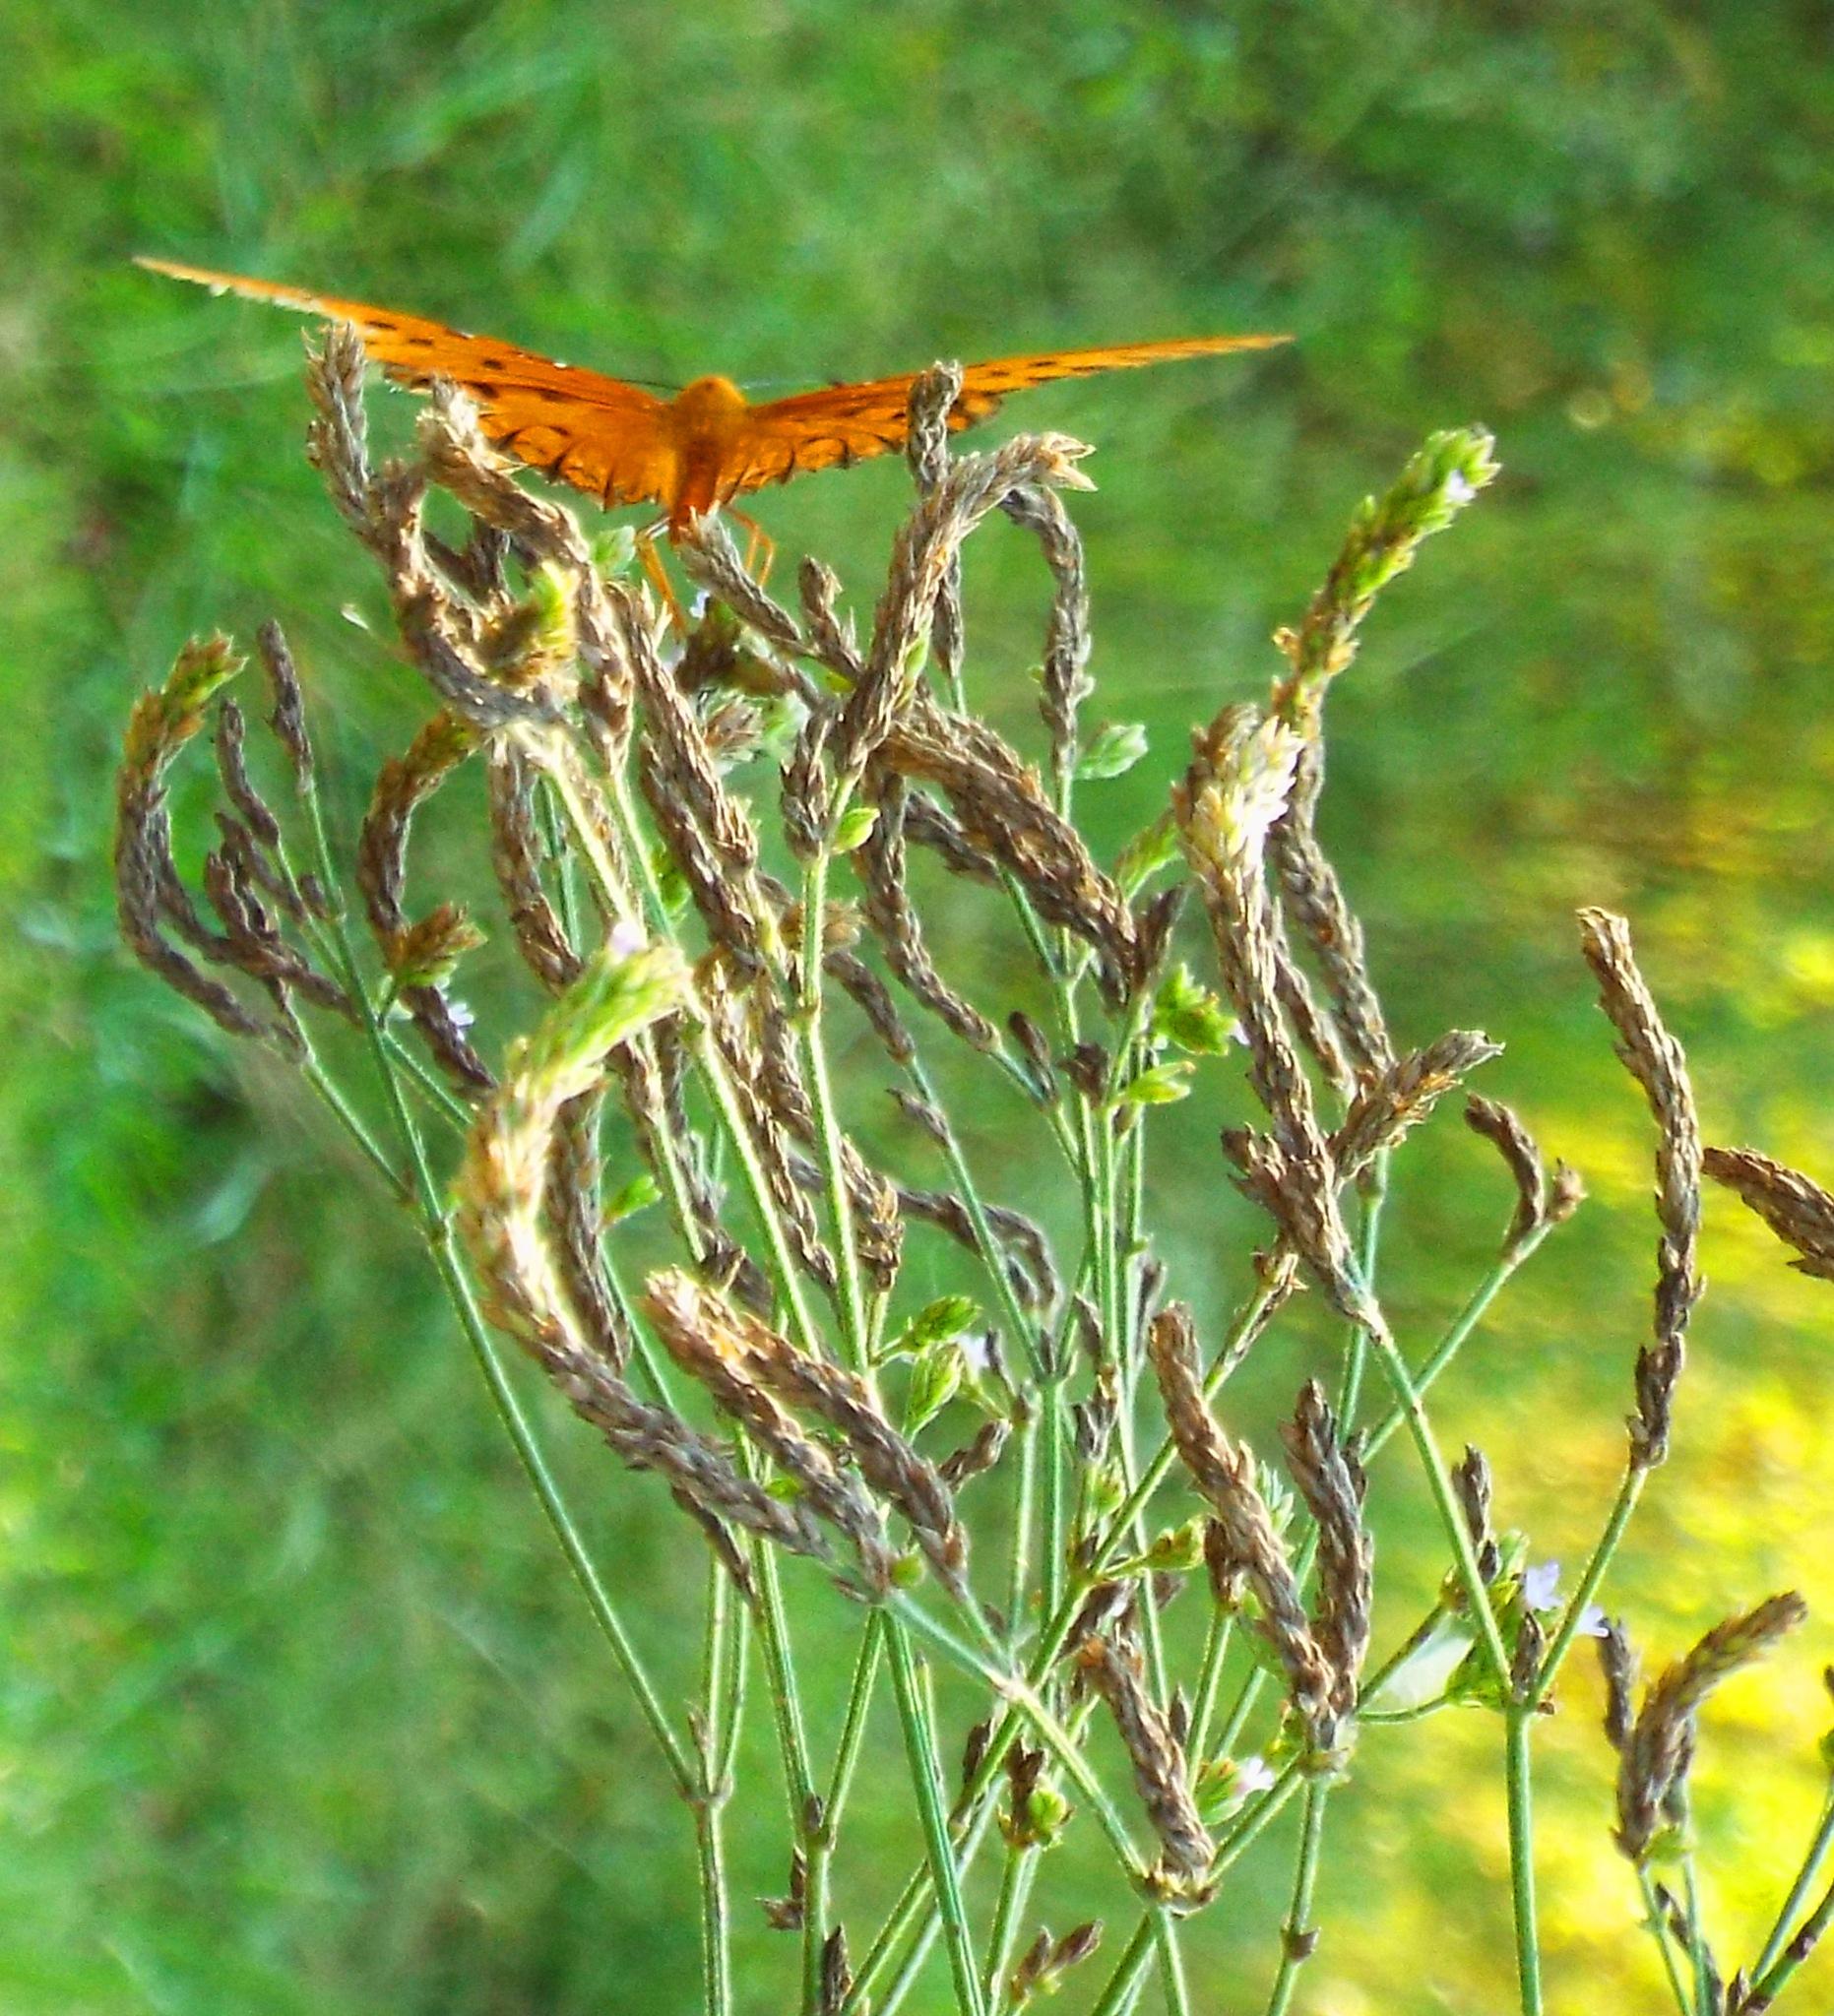 So many butterfly, so little time by Alex Ingram